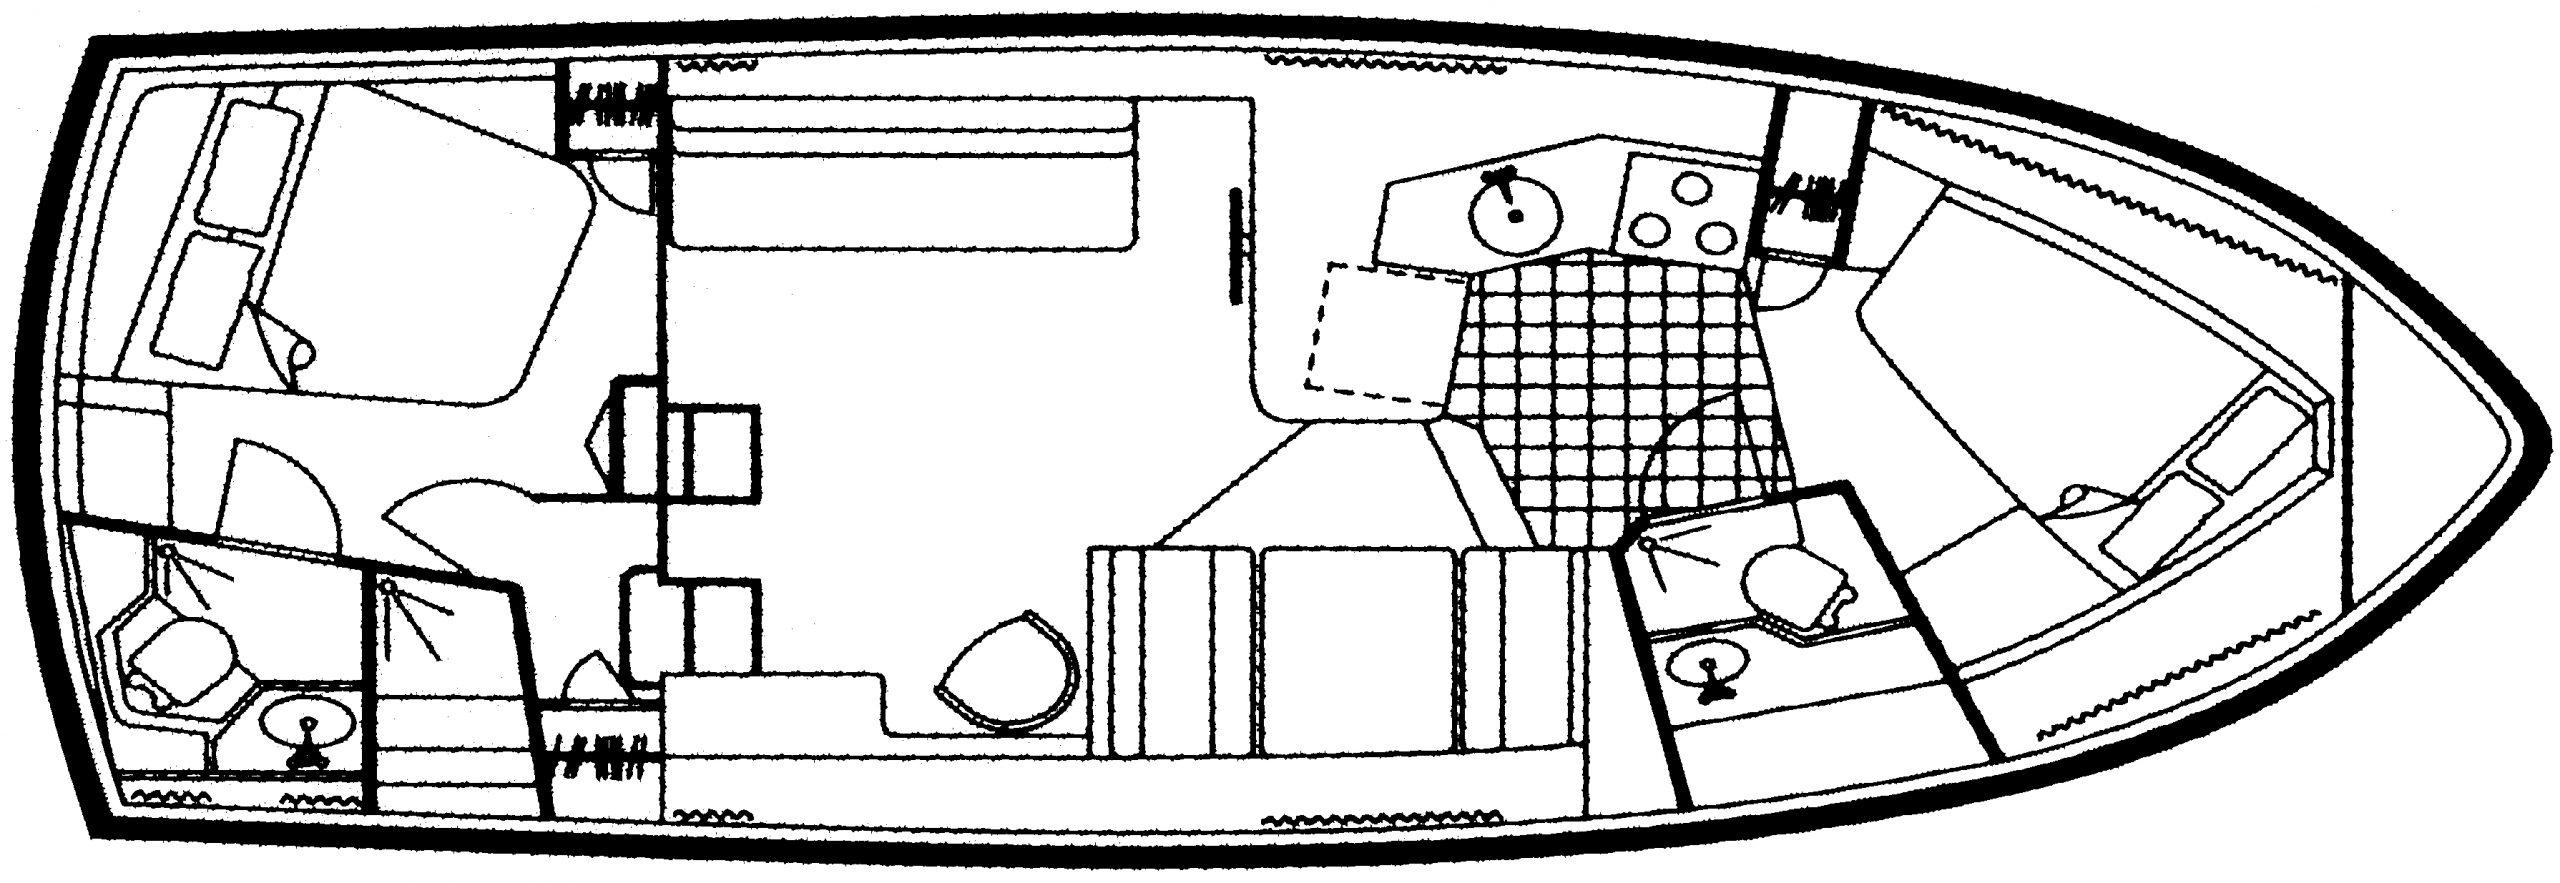 33 Aft Cabin; 350 Aft Cabin Floor Plan 1